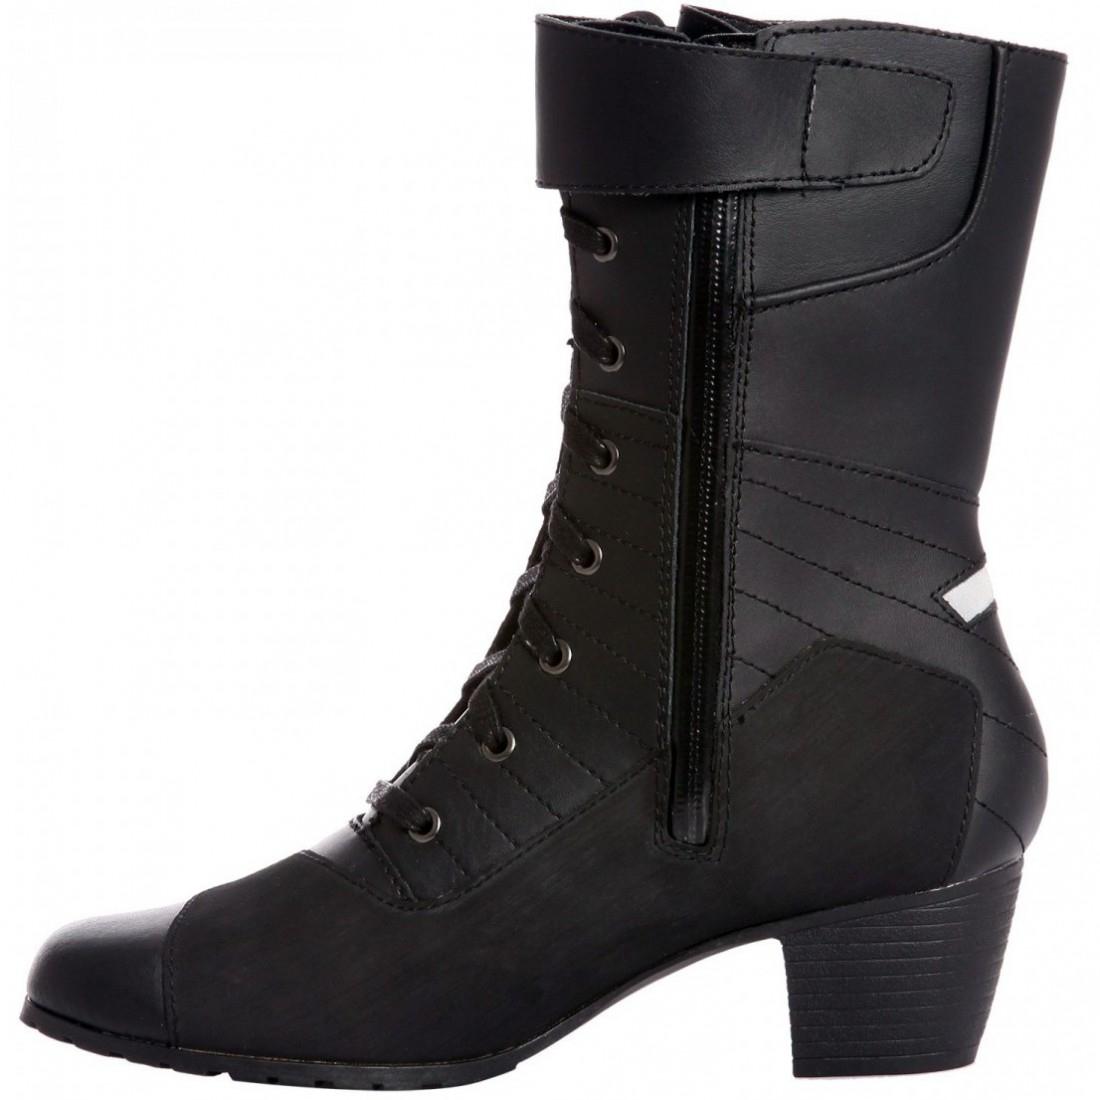 BERING Tera Lady Black Boots · Motocard